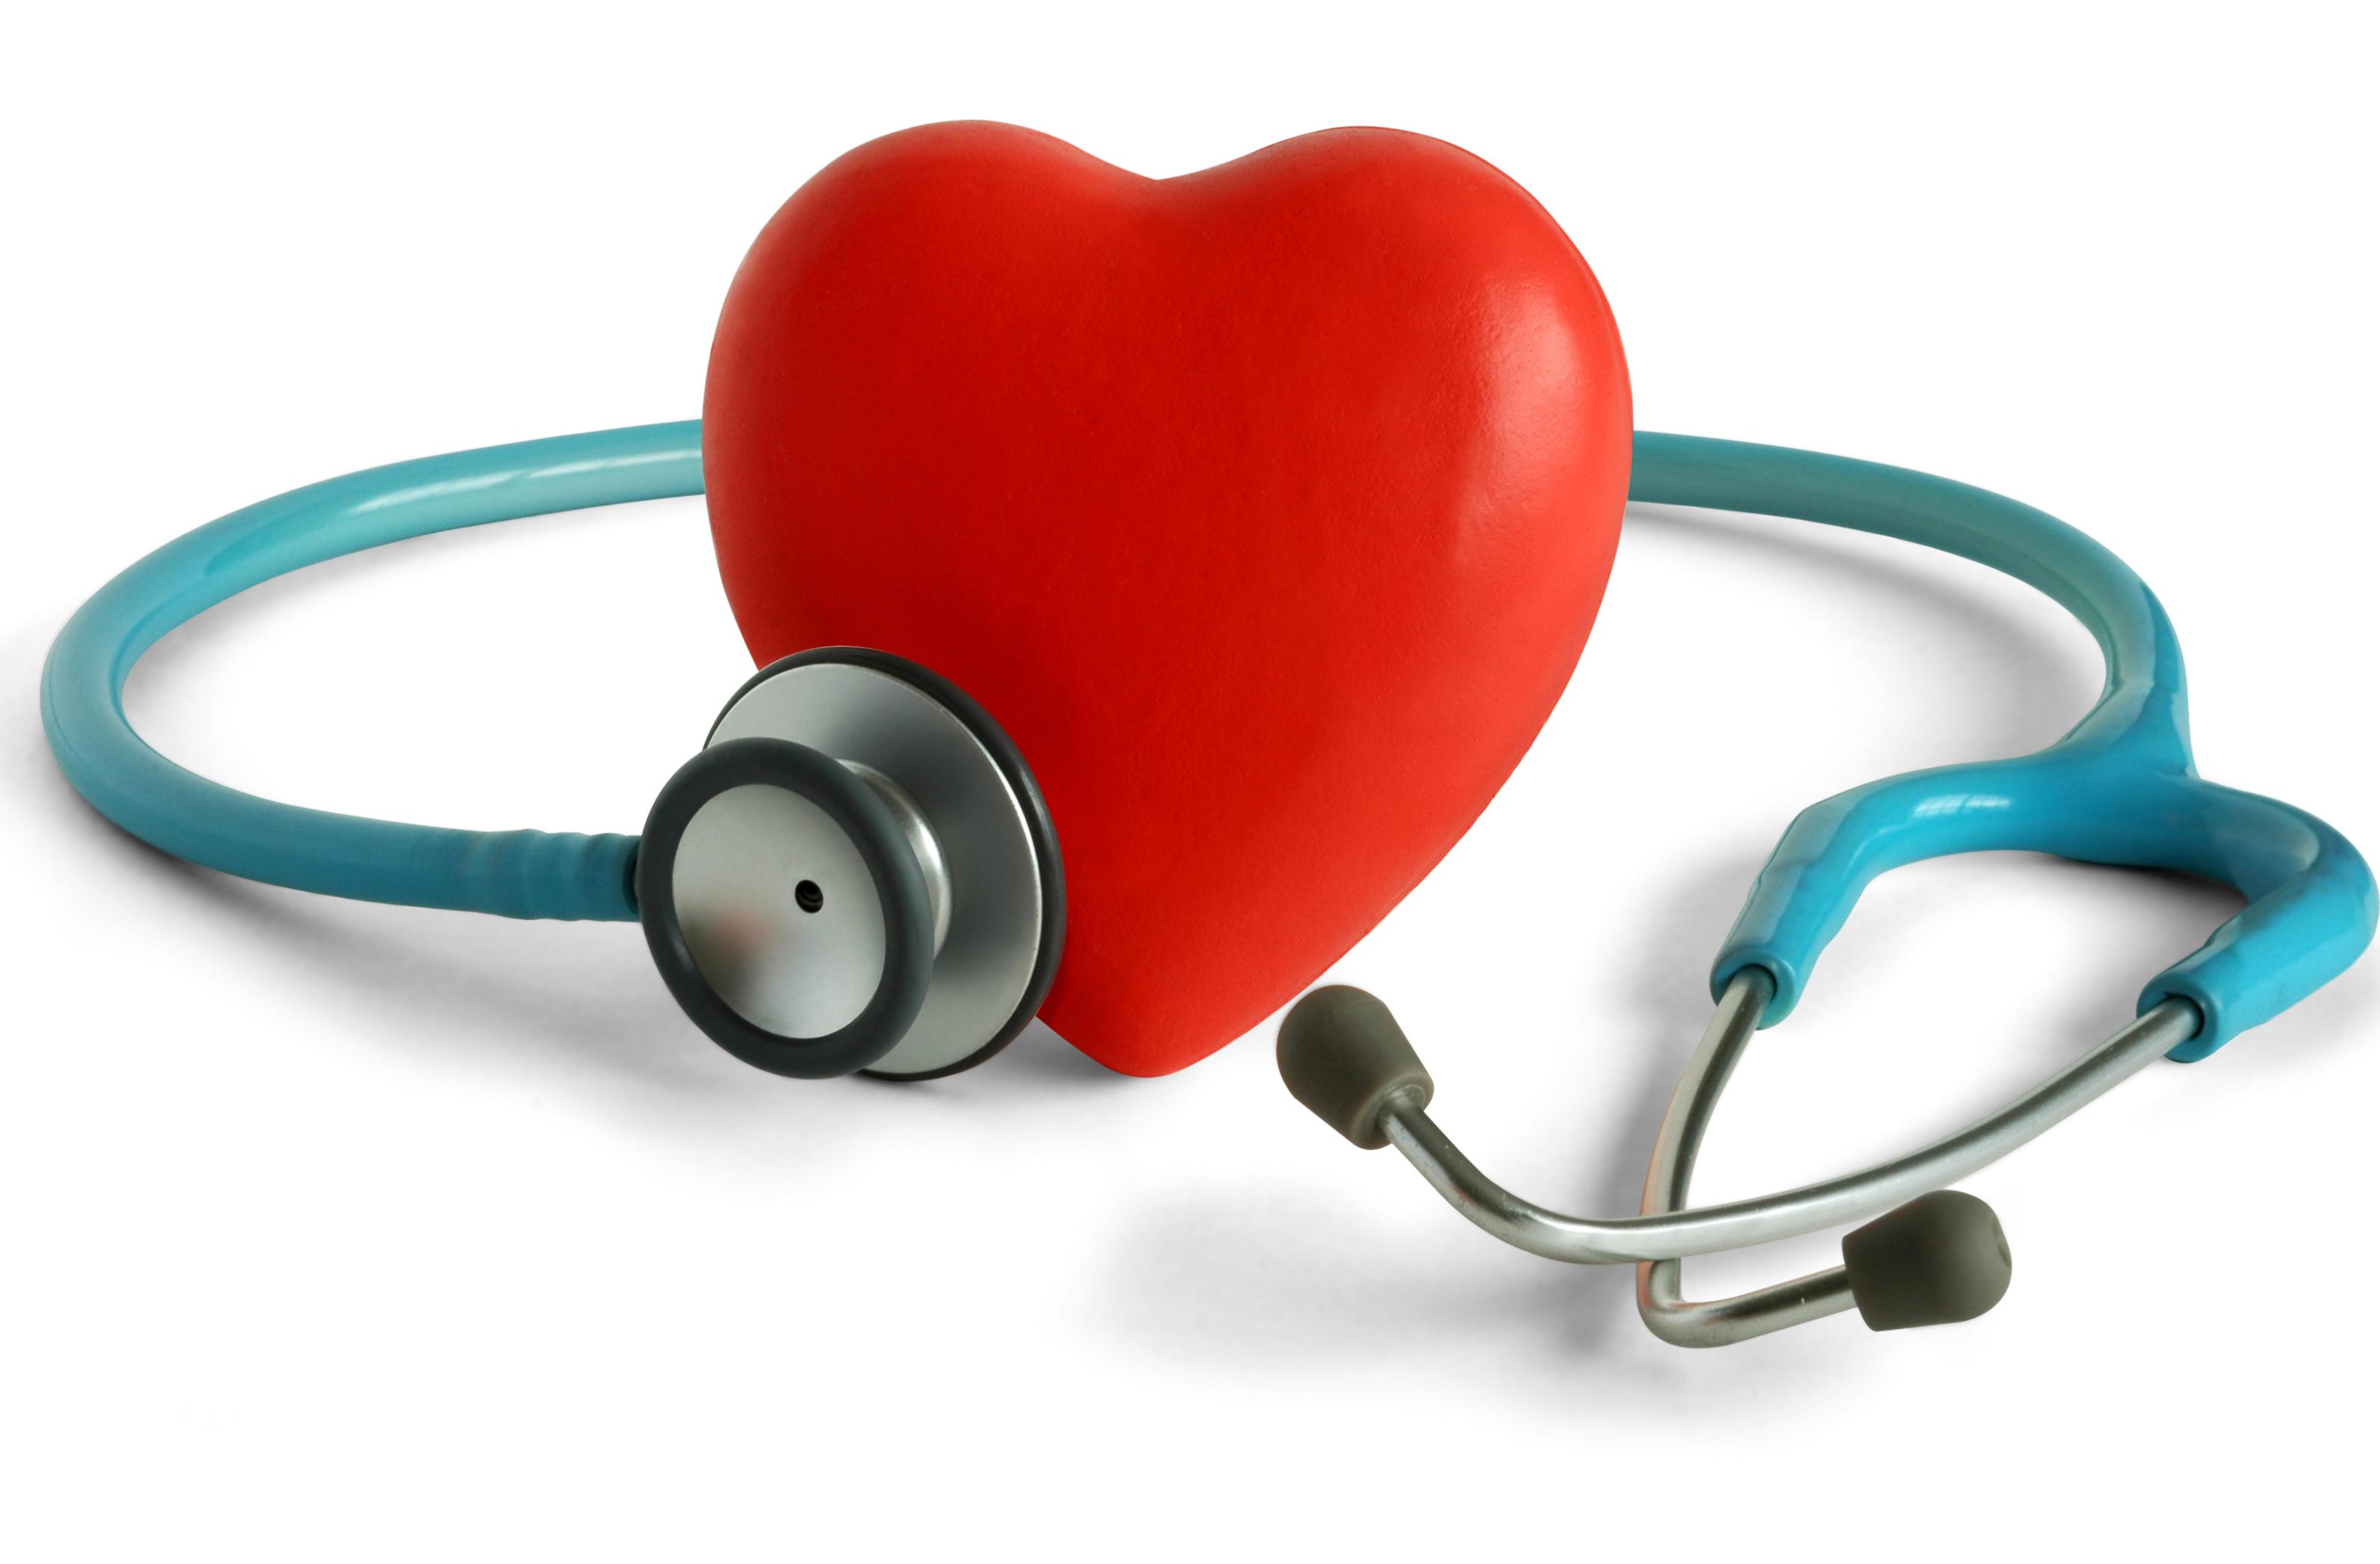 heart & steothoscope